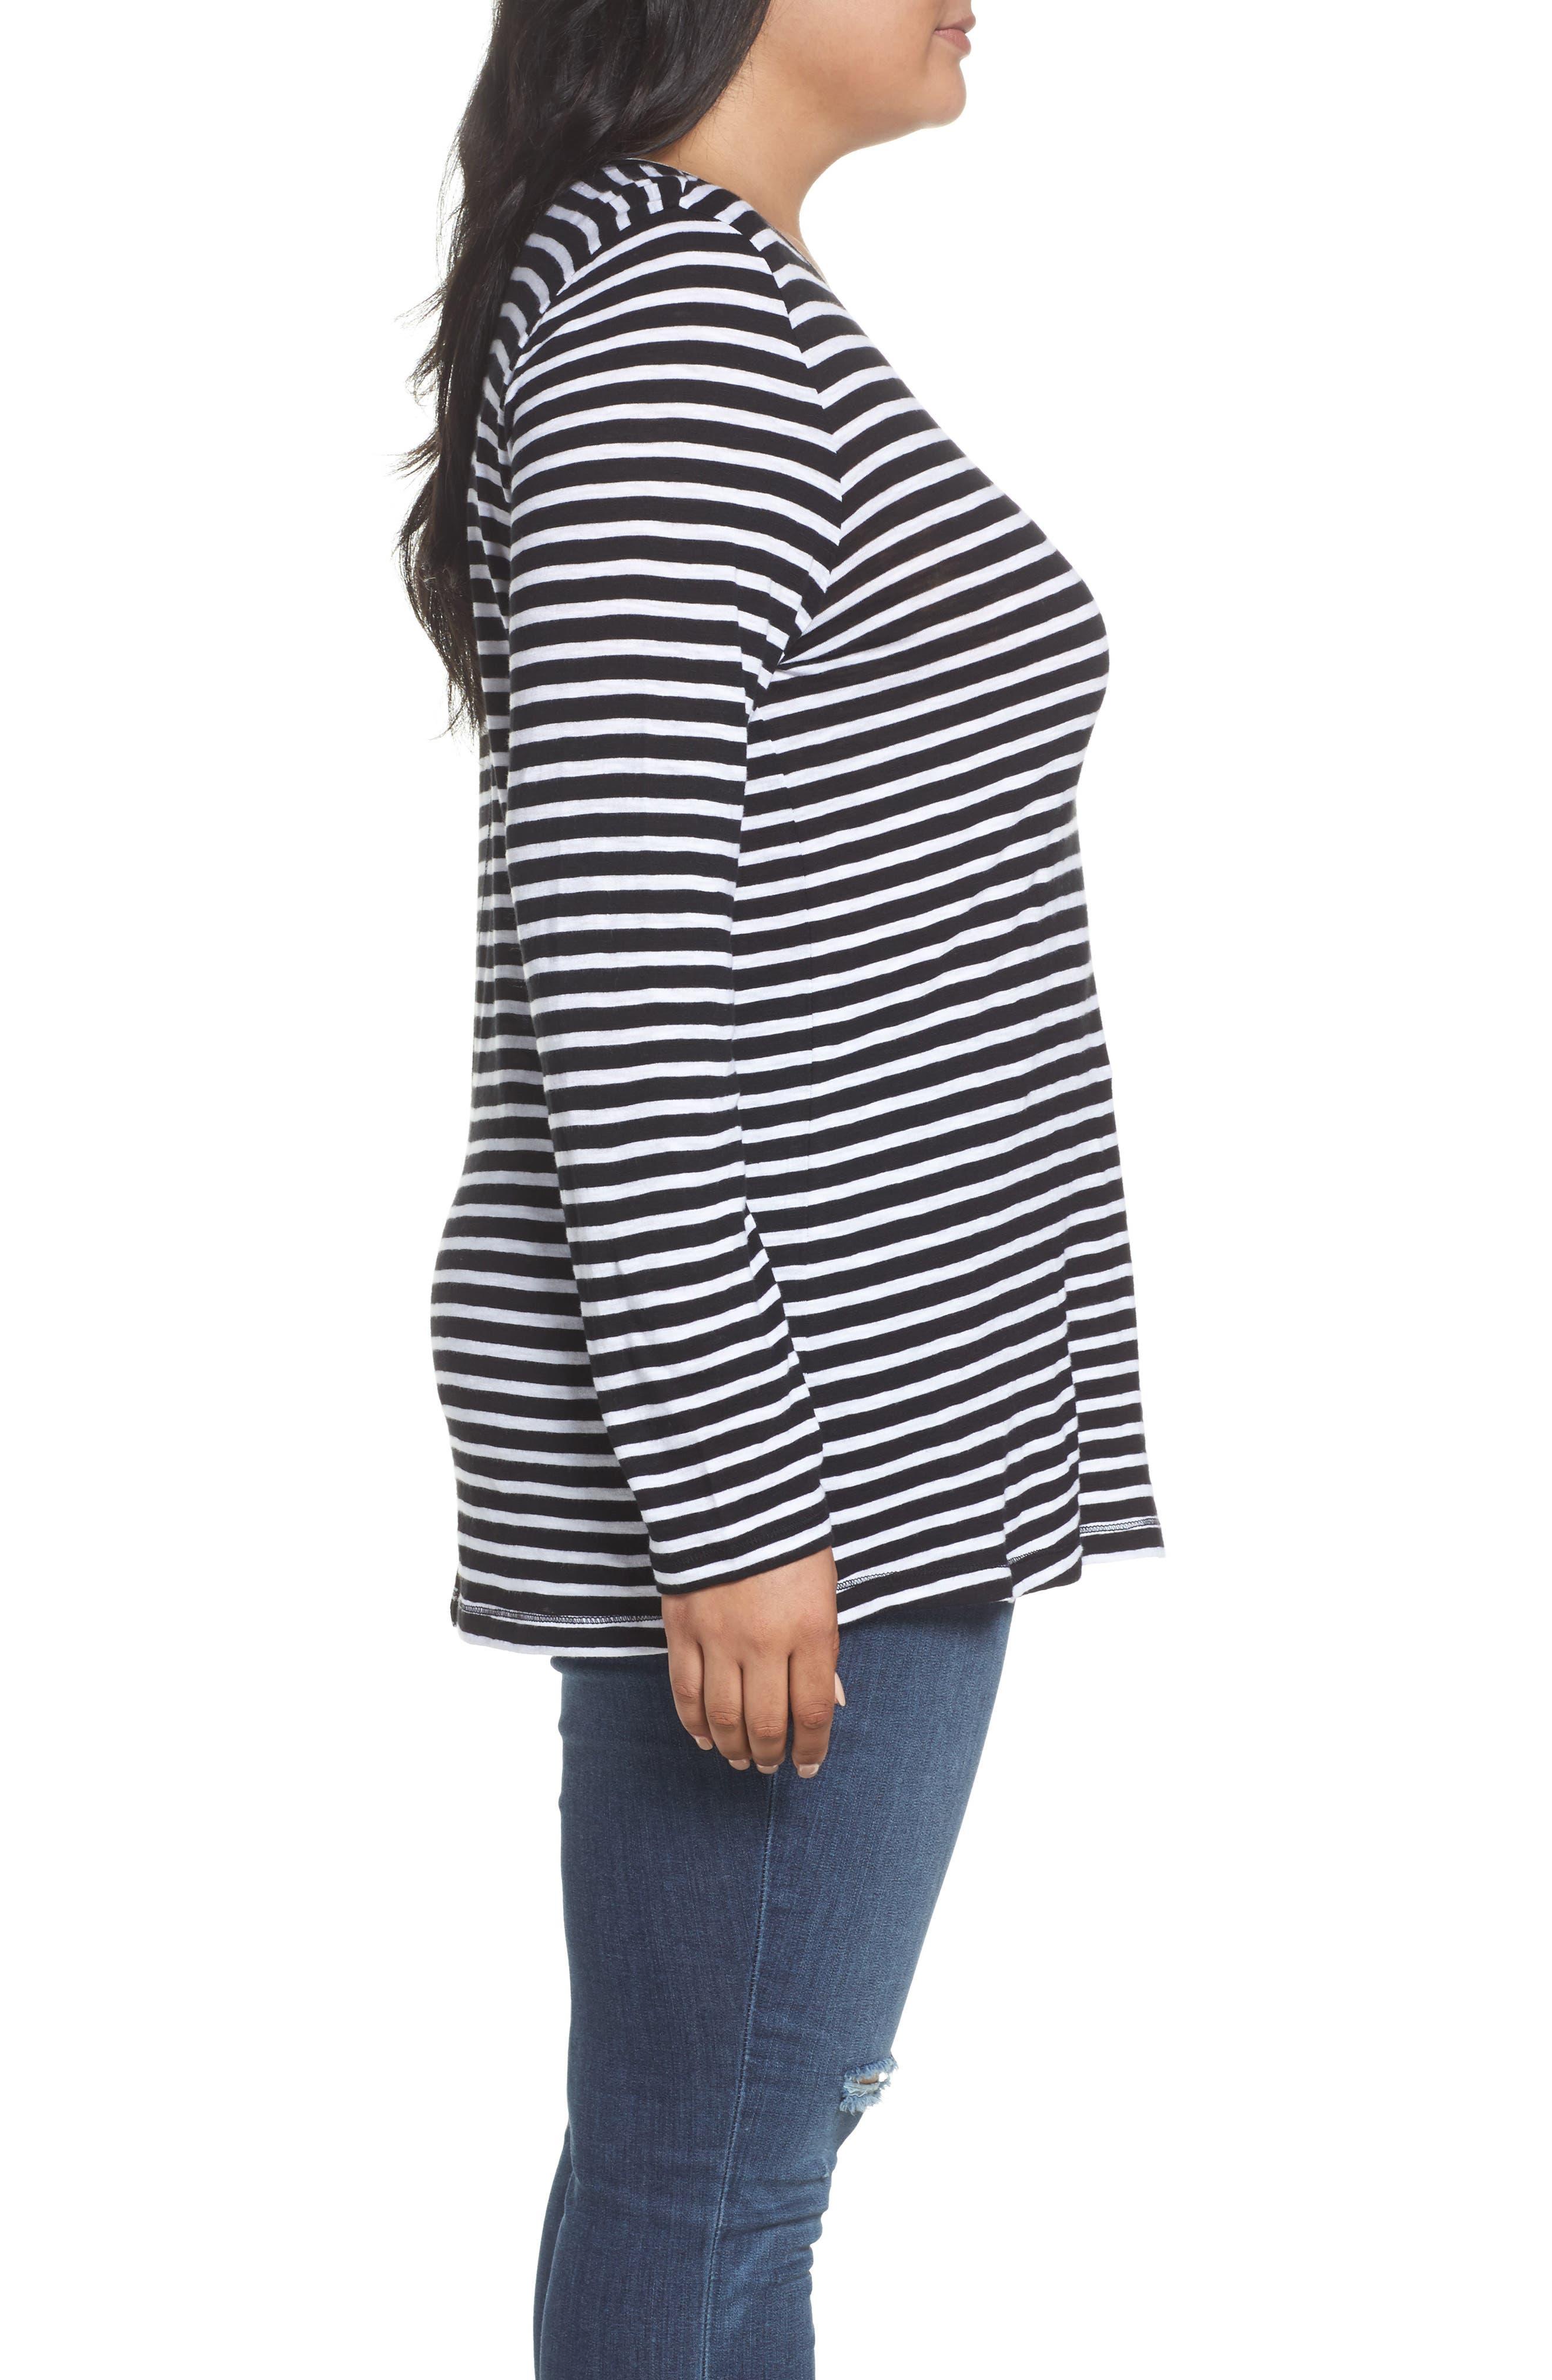 Long Sleeve Crewneck Tee,                             Alternate thumbnail 23, color,                             Black- White Maisie Stripe